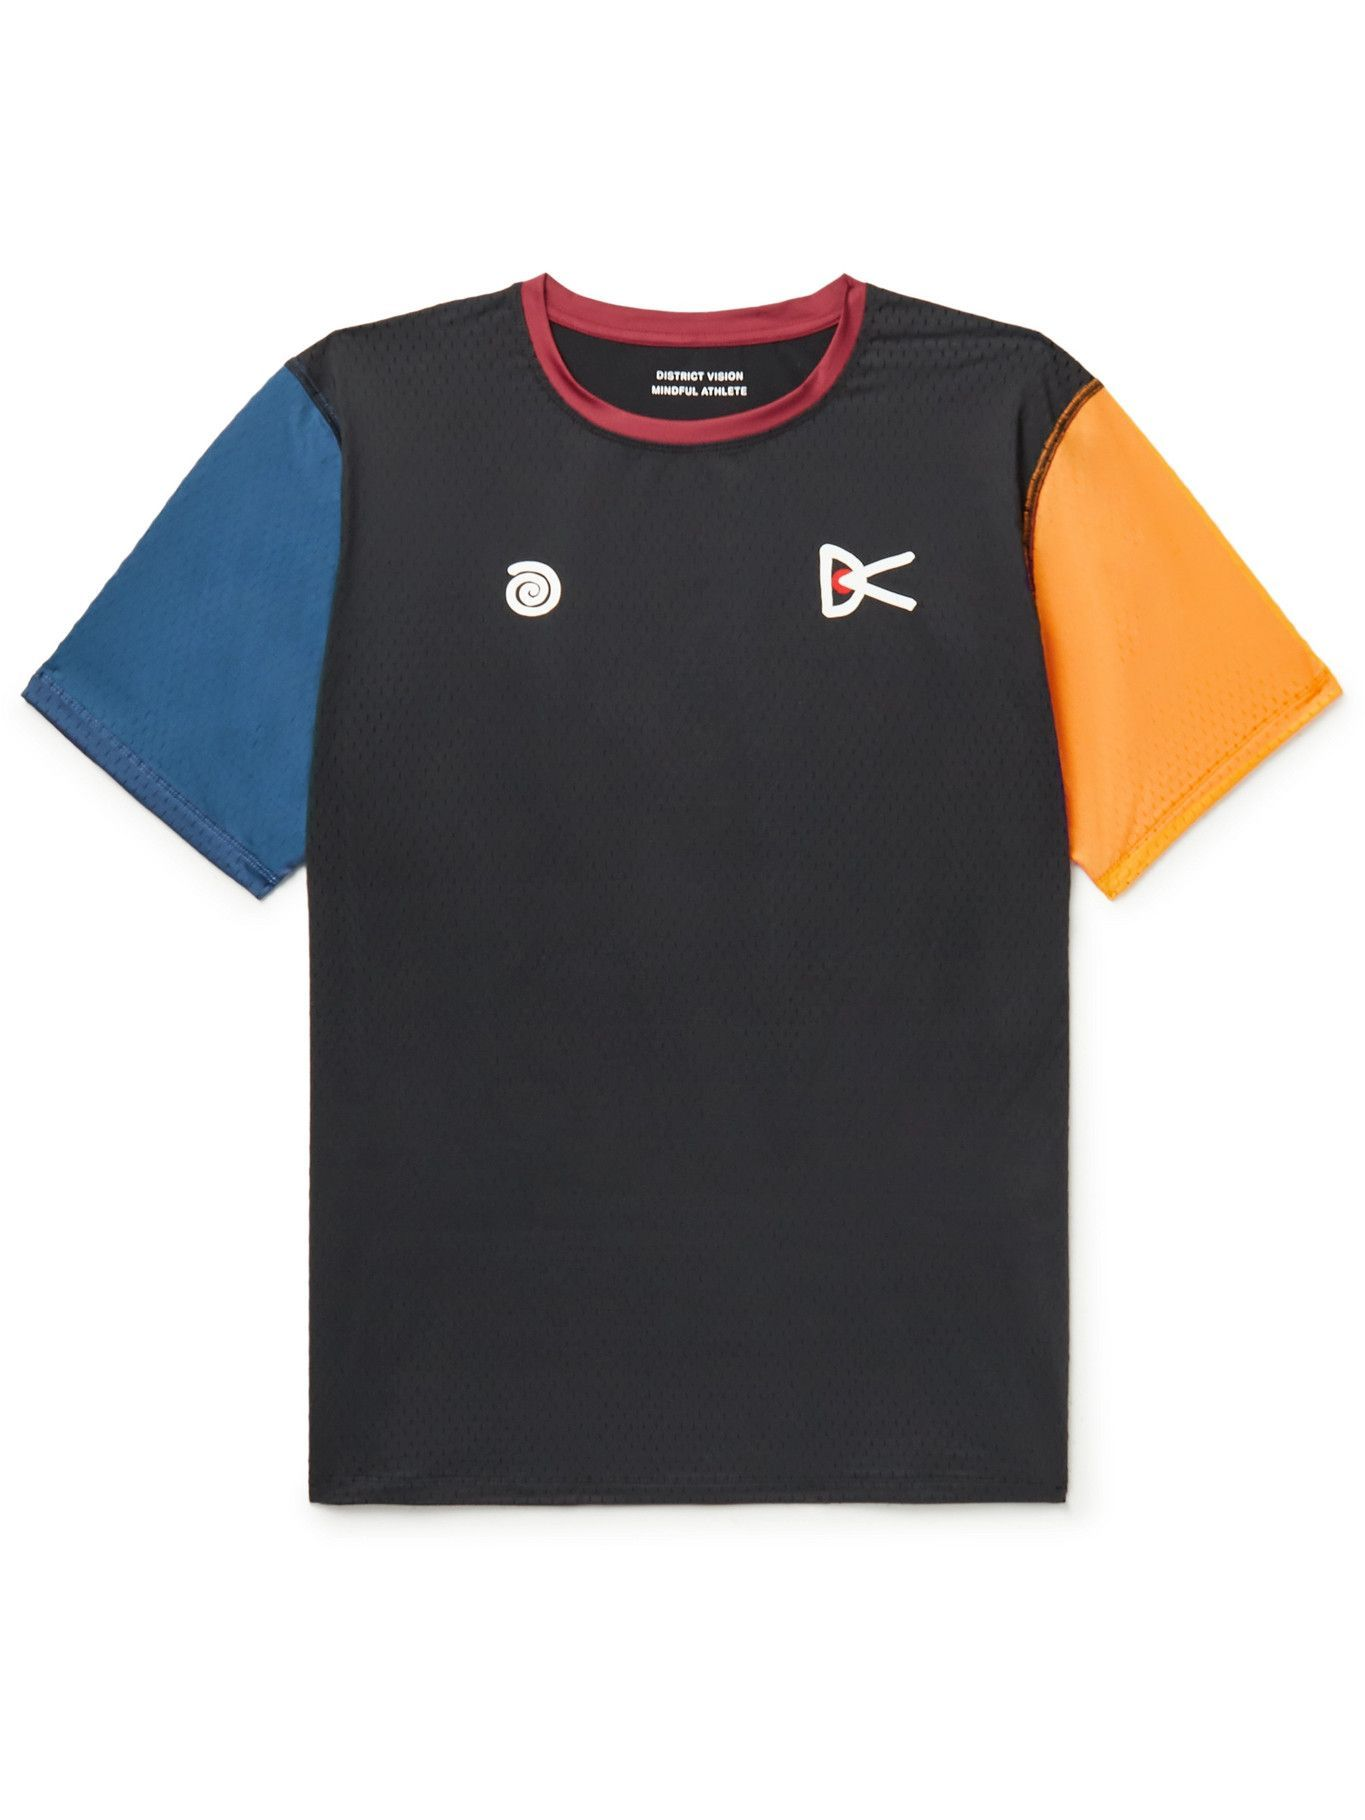 Photo: DISTRICT VISION - MR PORTER Health In Mind Air-Wear Colour-Block Stretch-Mesh T-Shirt - Black